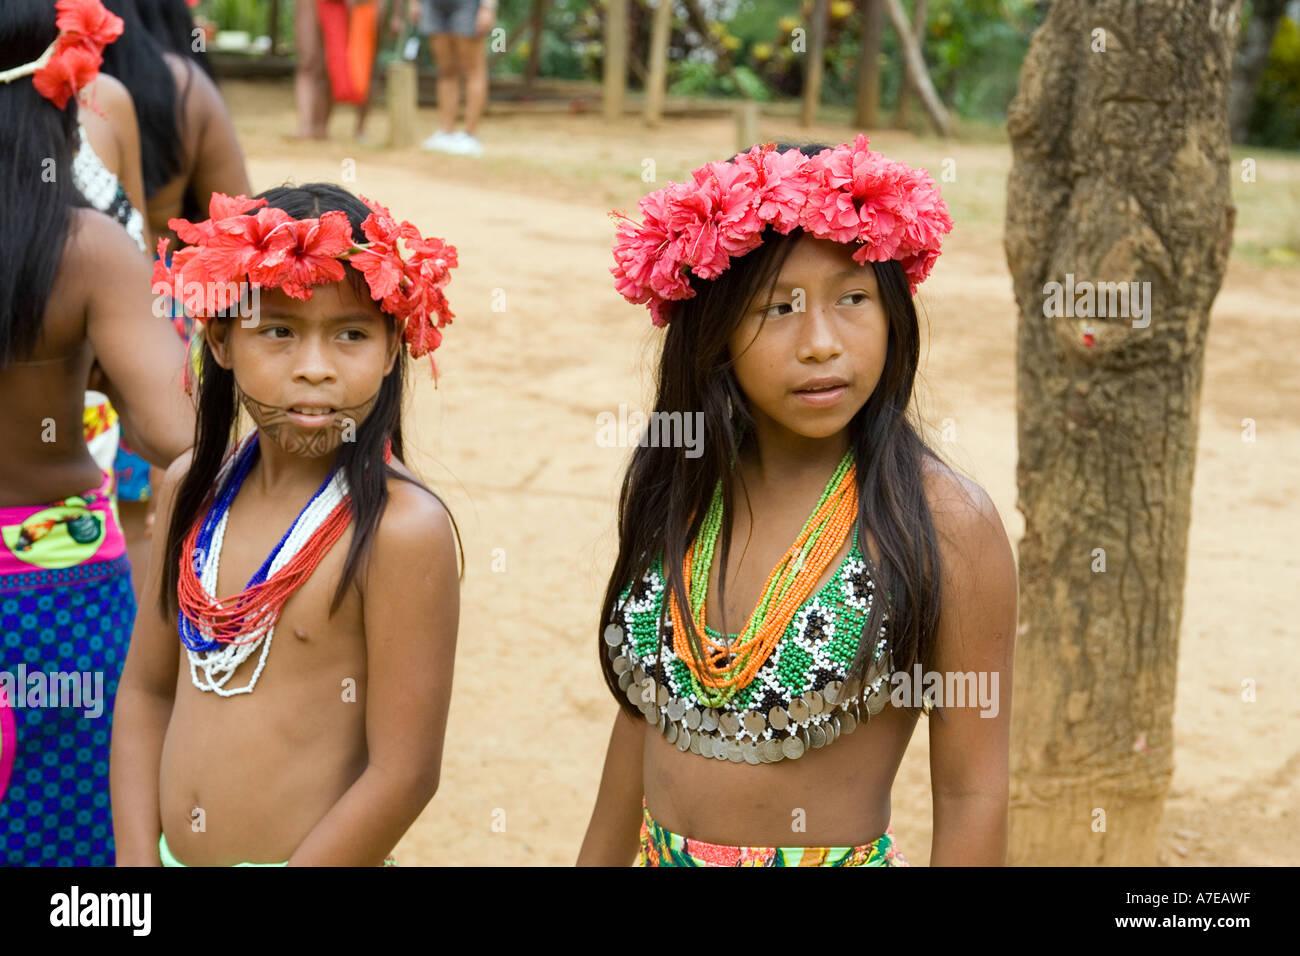 Embera Drua Village Stock Photo: 6750750 - Alamy